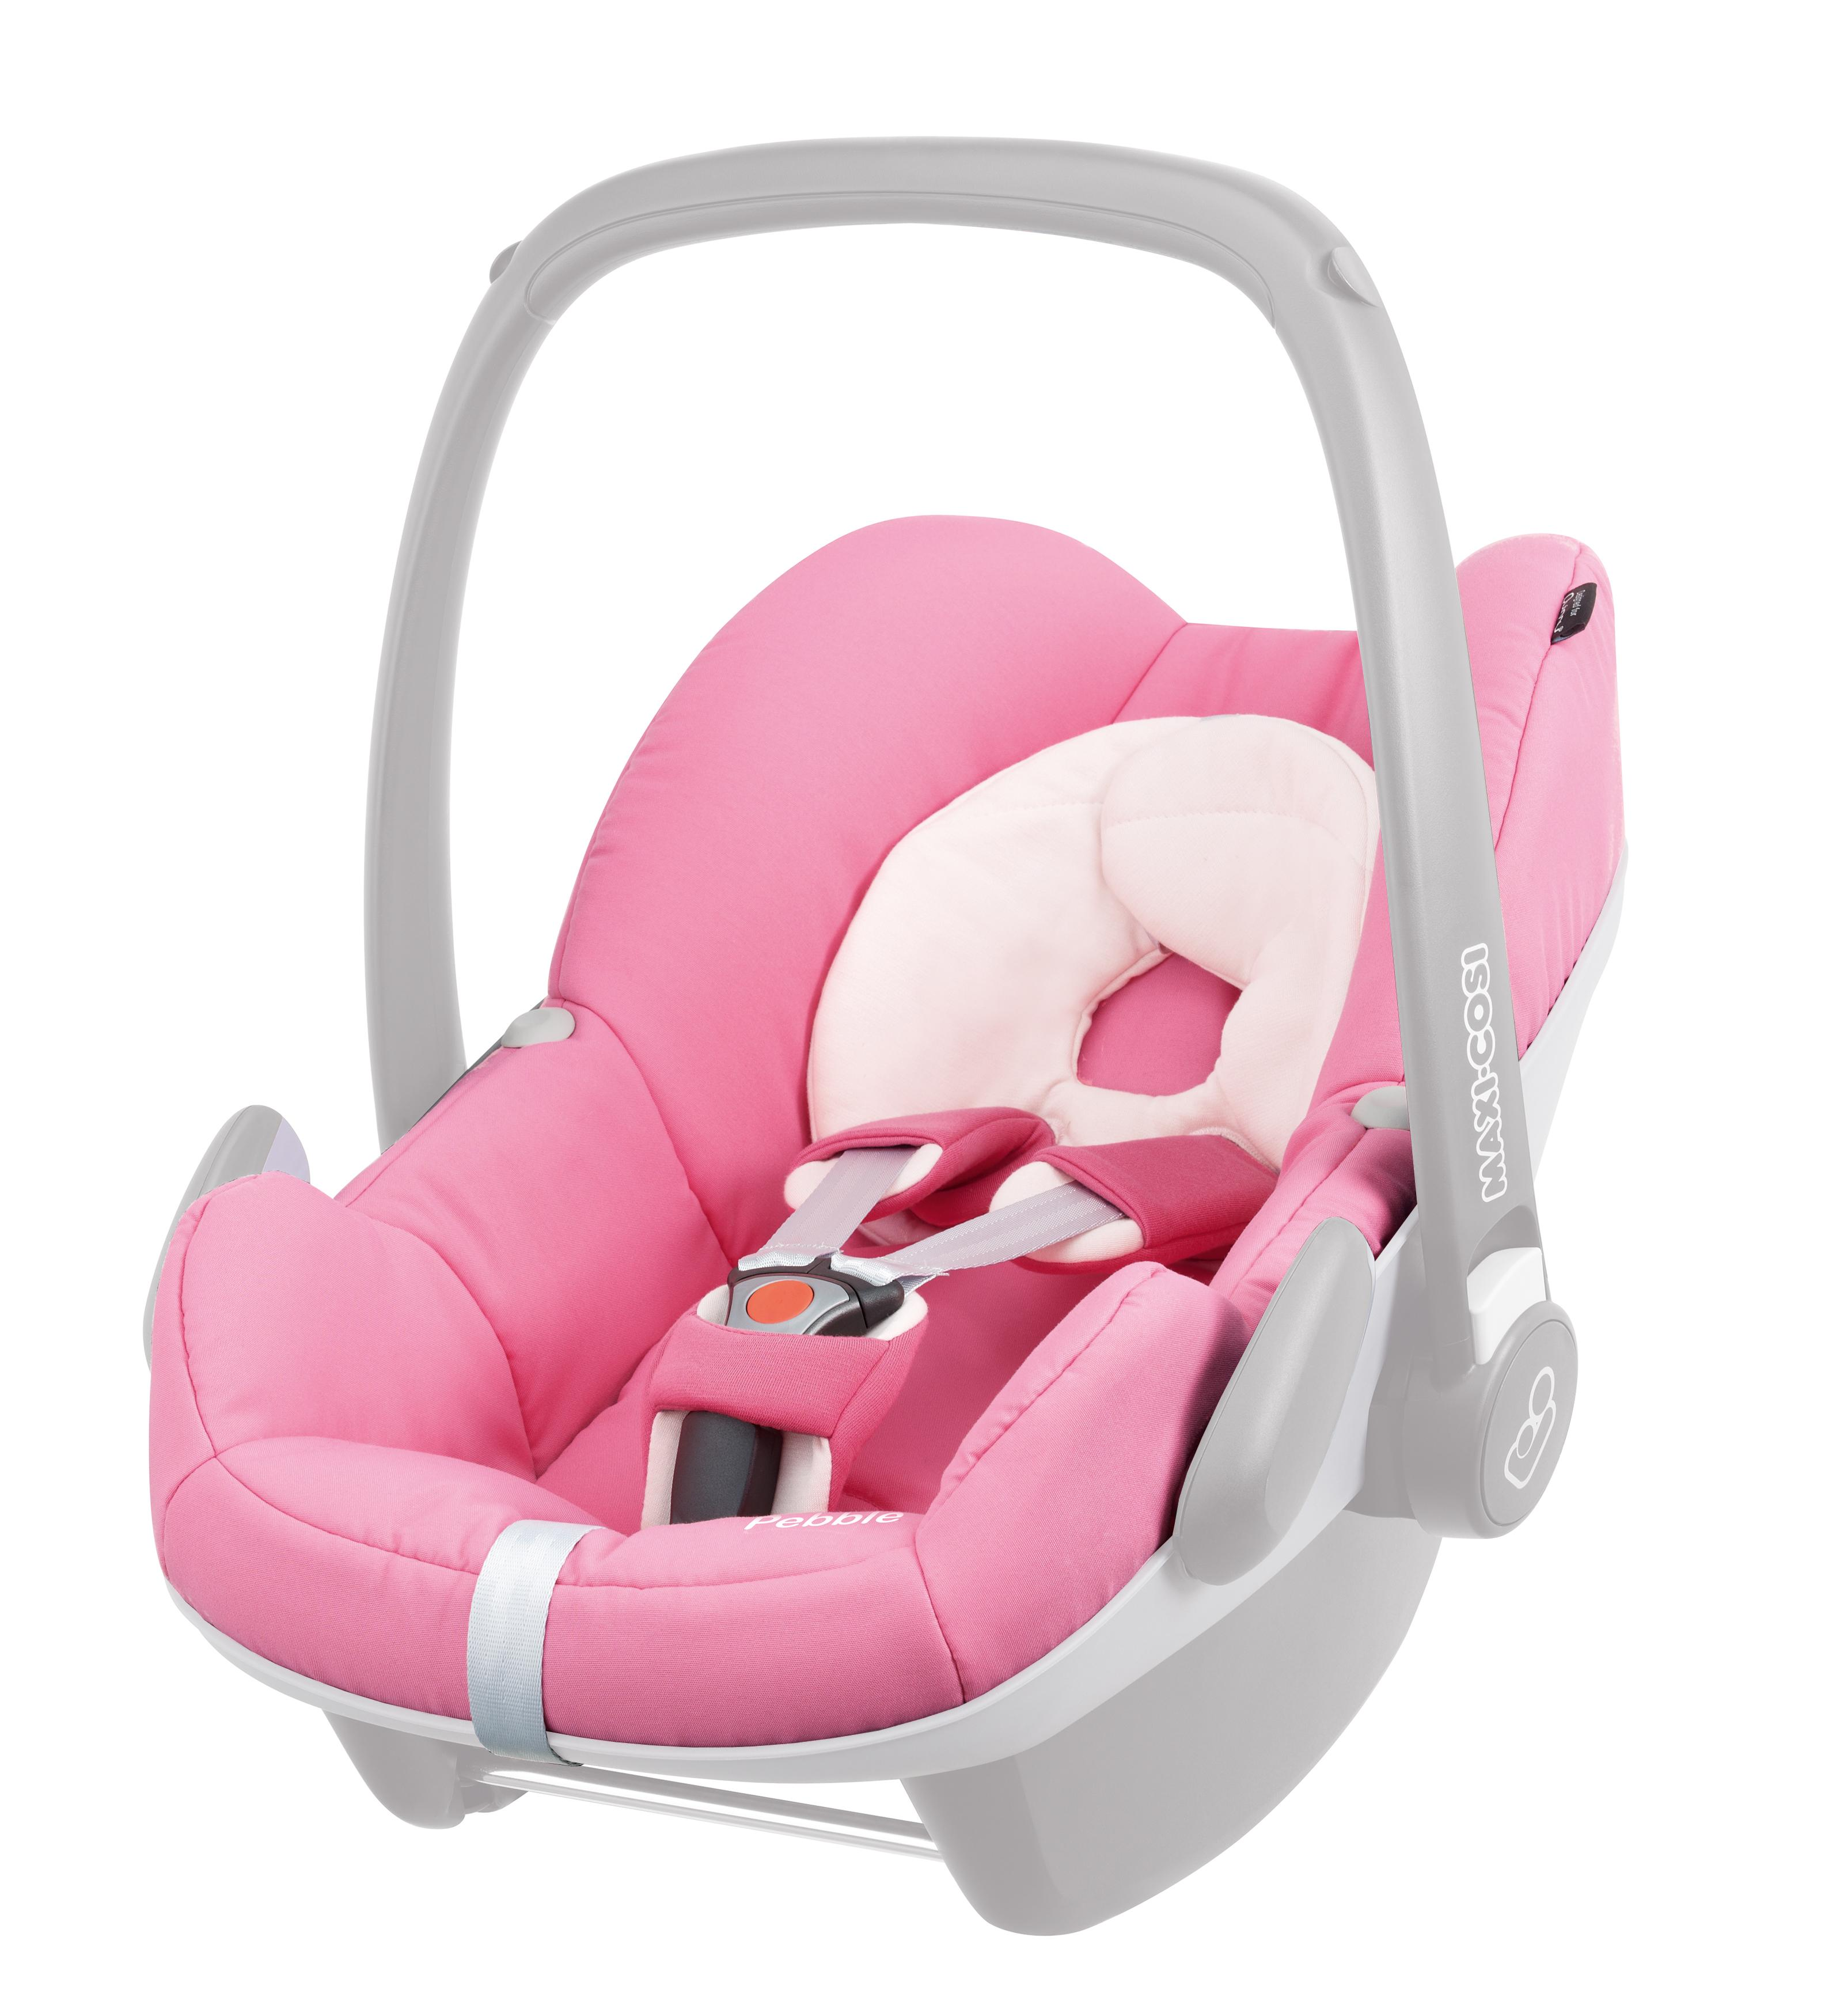 Maxi Cosi Pebble Replacement Seat Cover Pink Precious 2014 Range